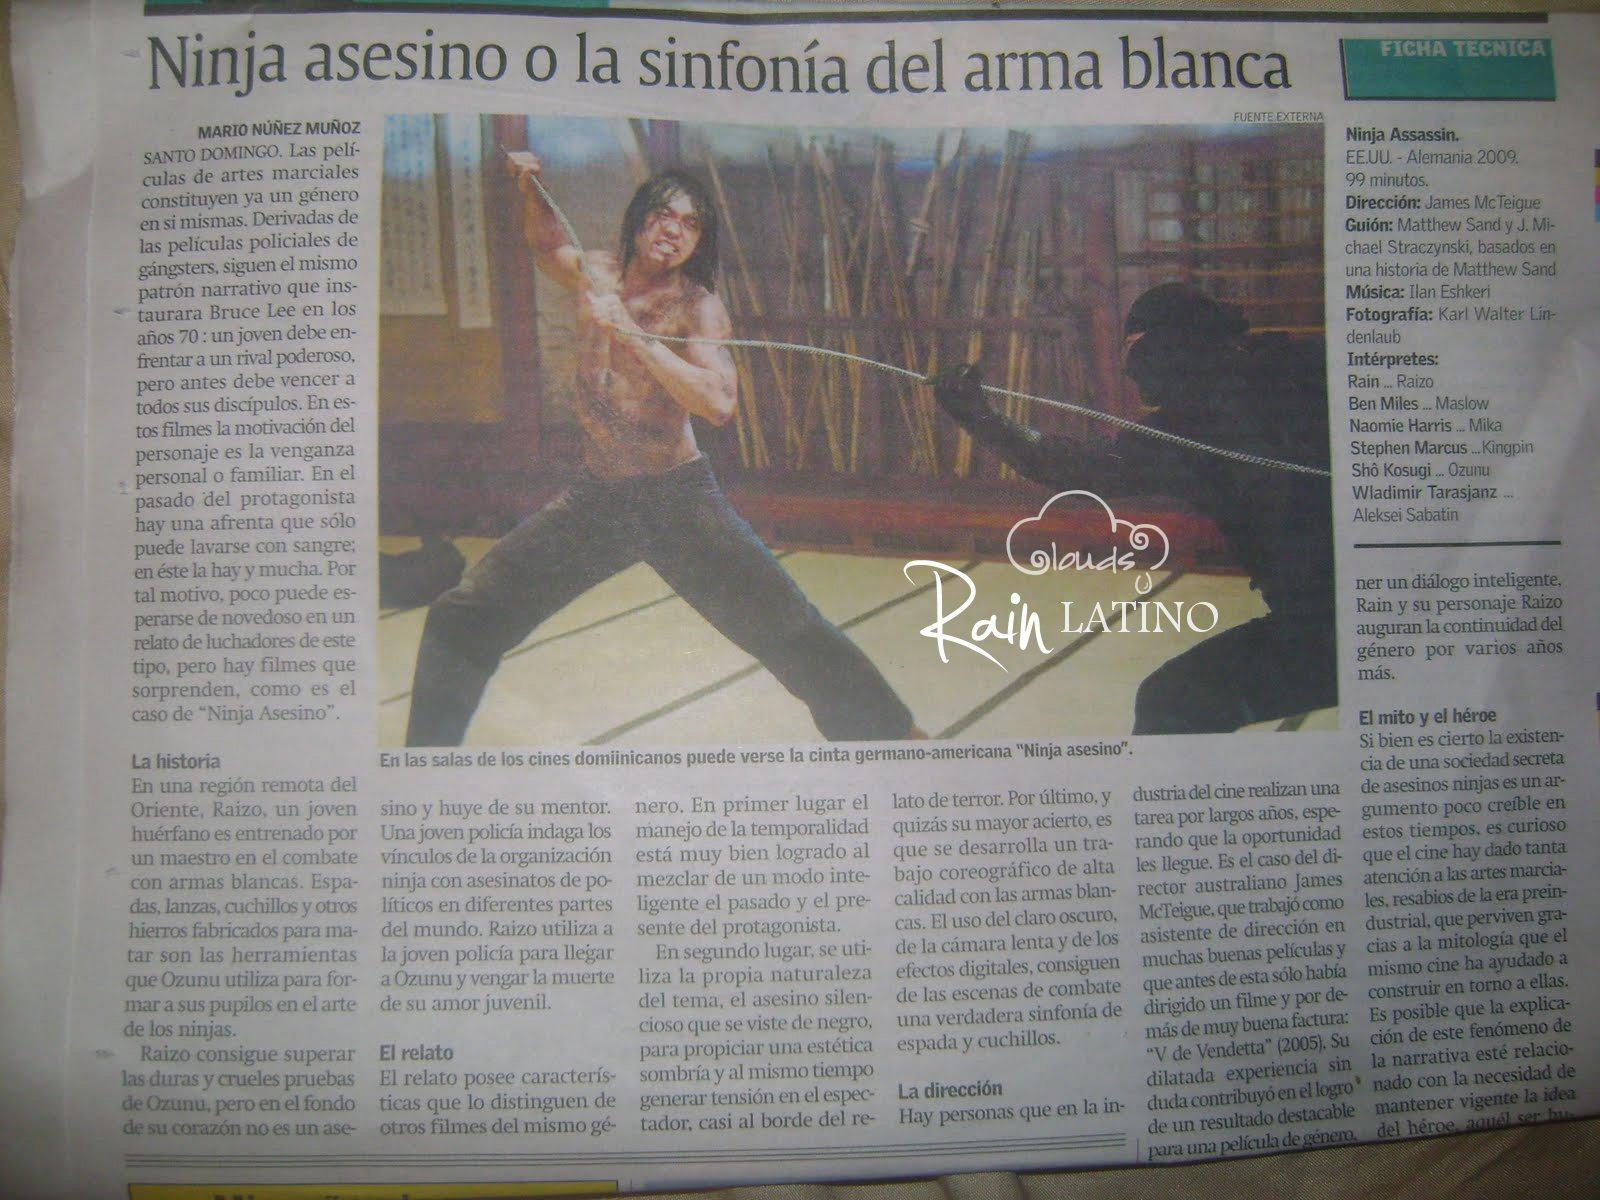 http://sixtofive1982.files.wordpress.com/2010/03/ninjalatino.jpg